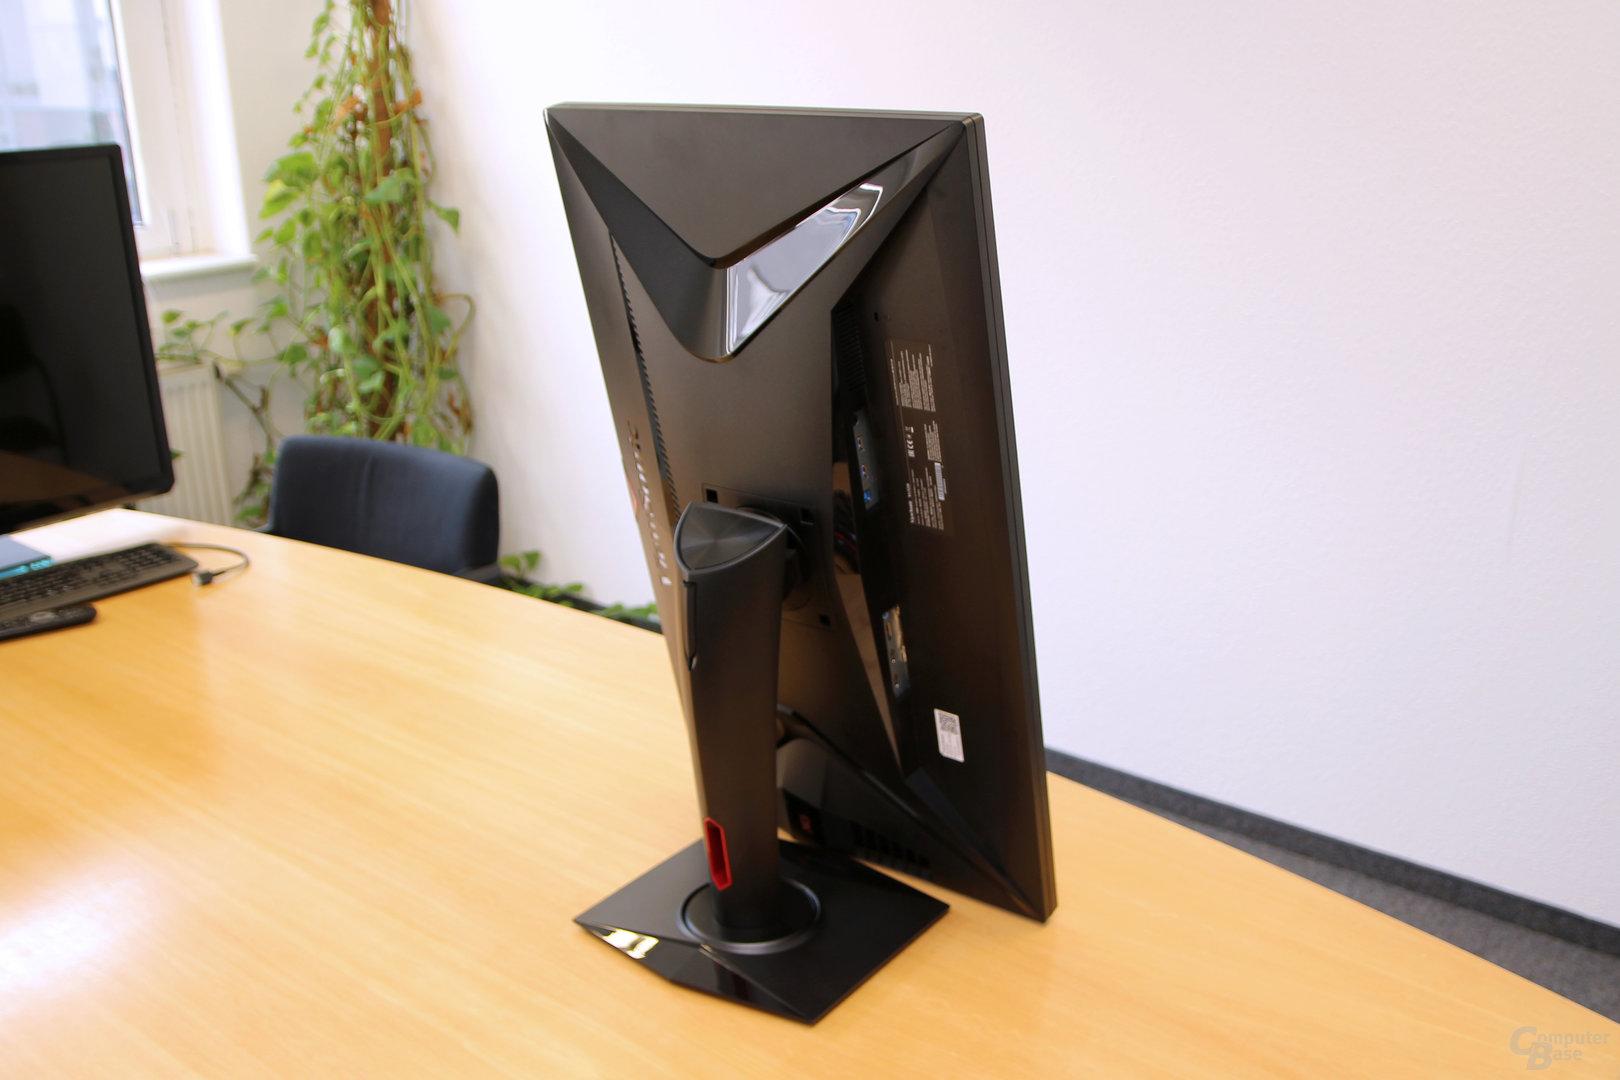 ViewSonic XG3220 – Knapp an Pivot vorbei